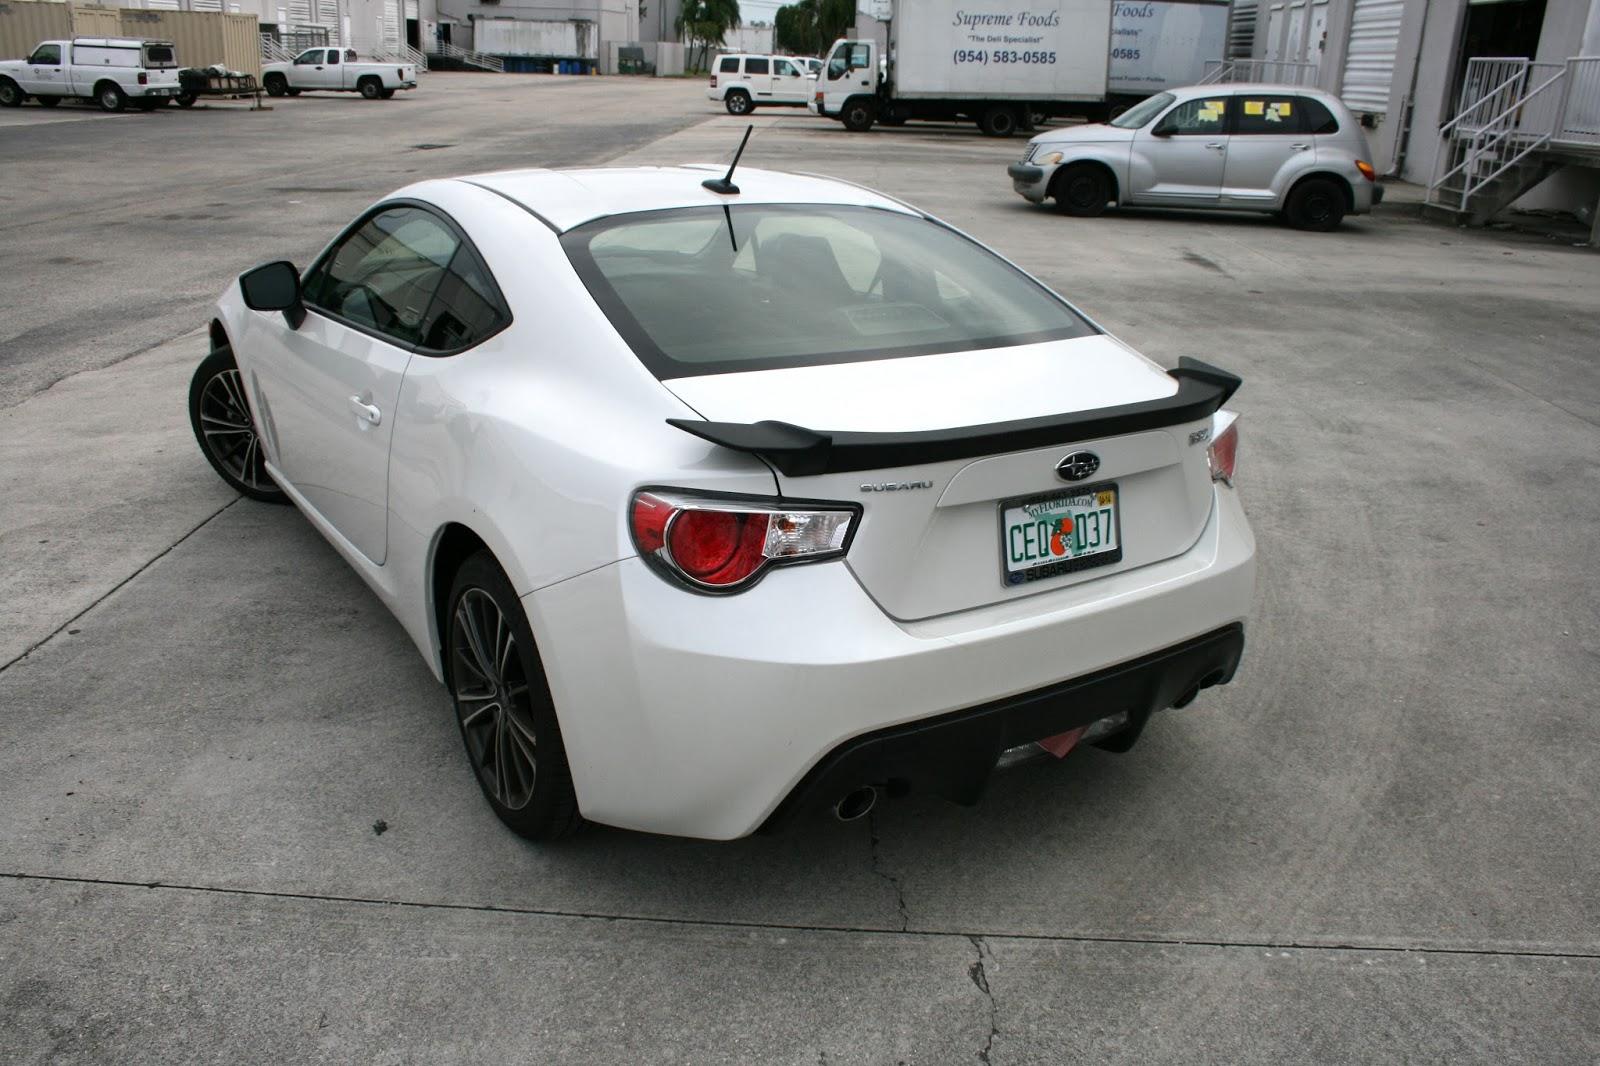 Custom Subaru Brz Carbon Fiber Vinyl Wrapped Mirrors Hood Miami